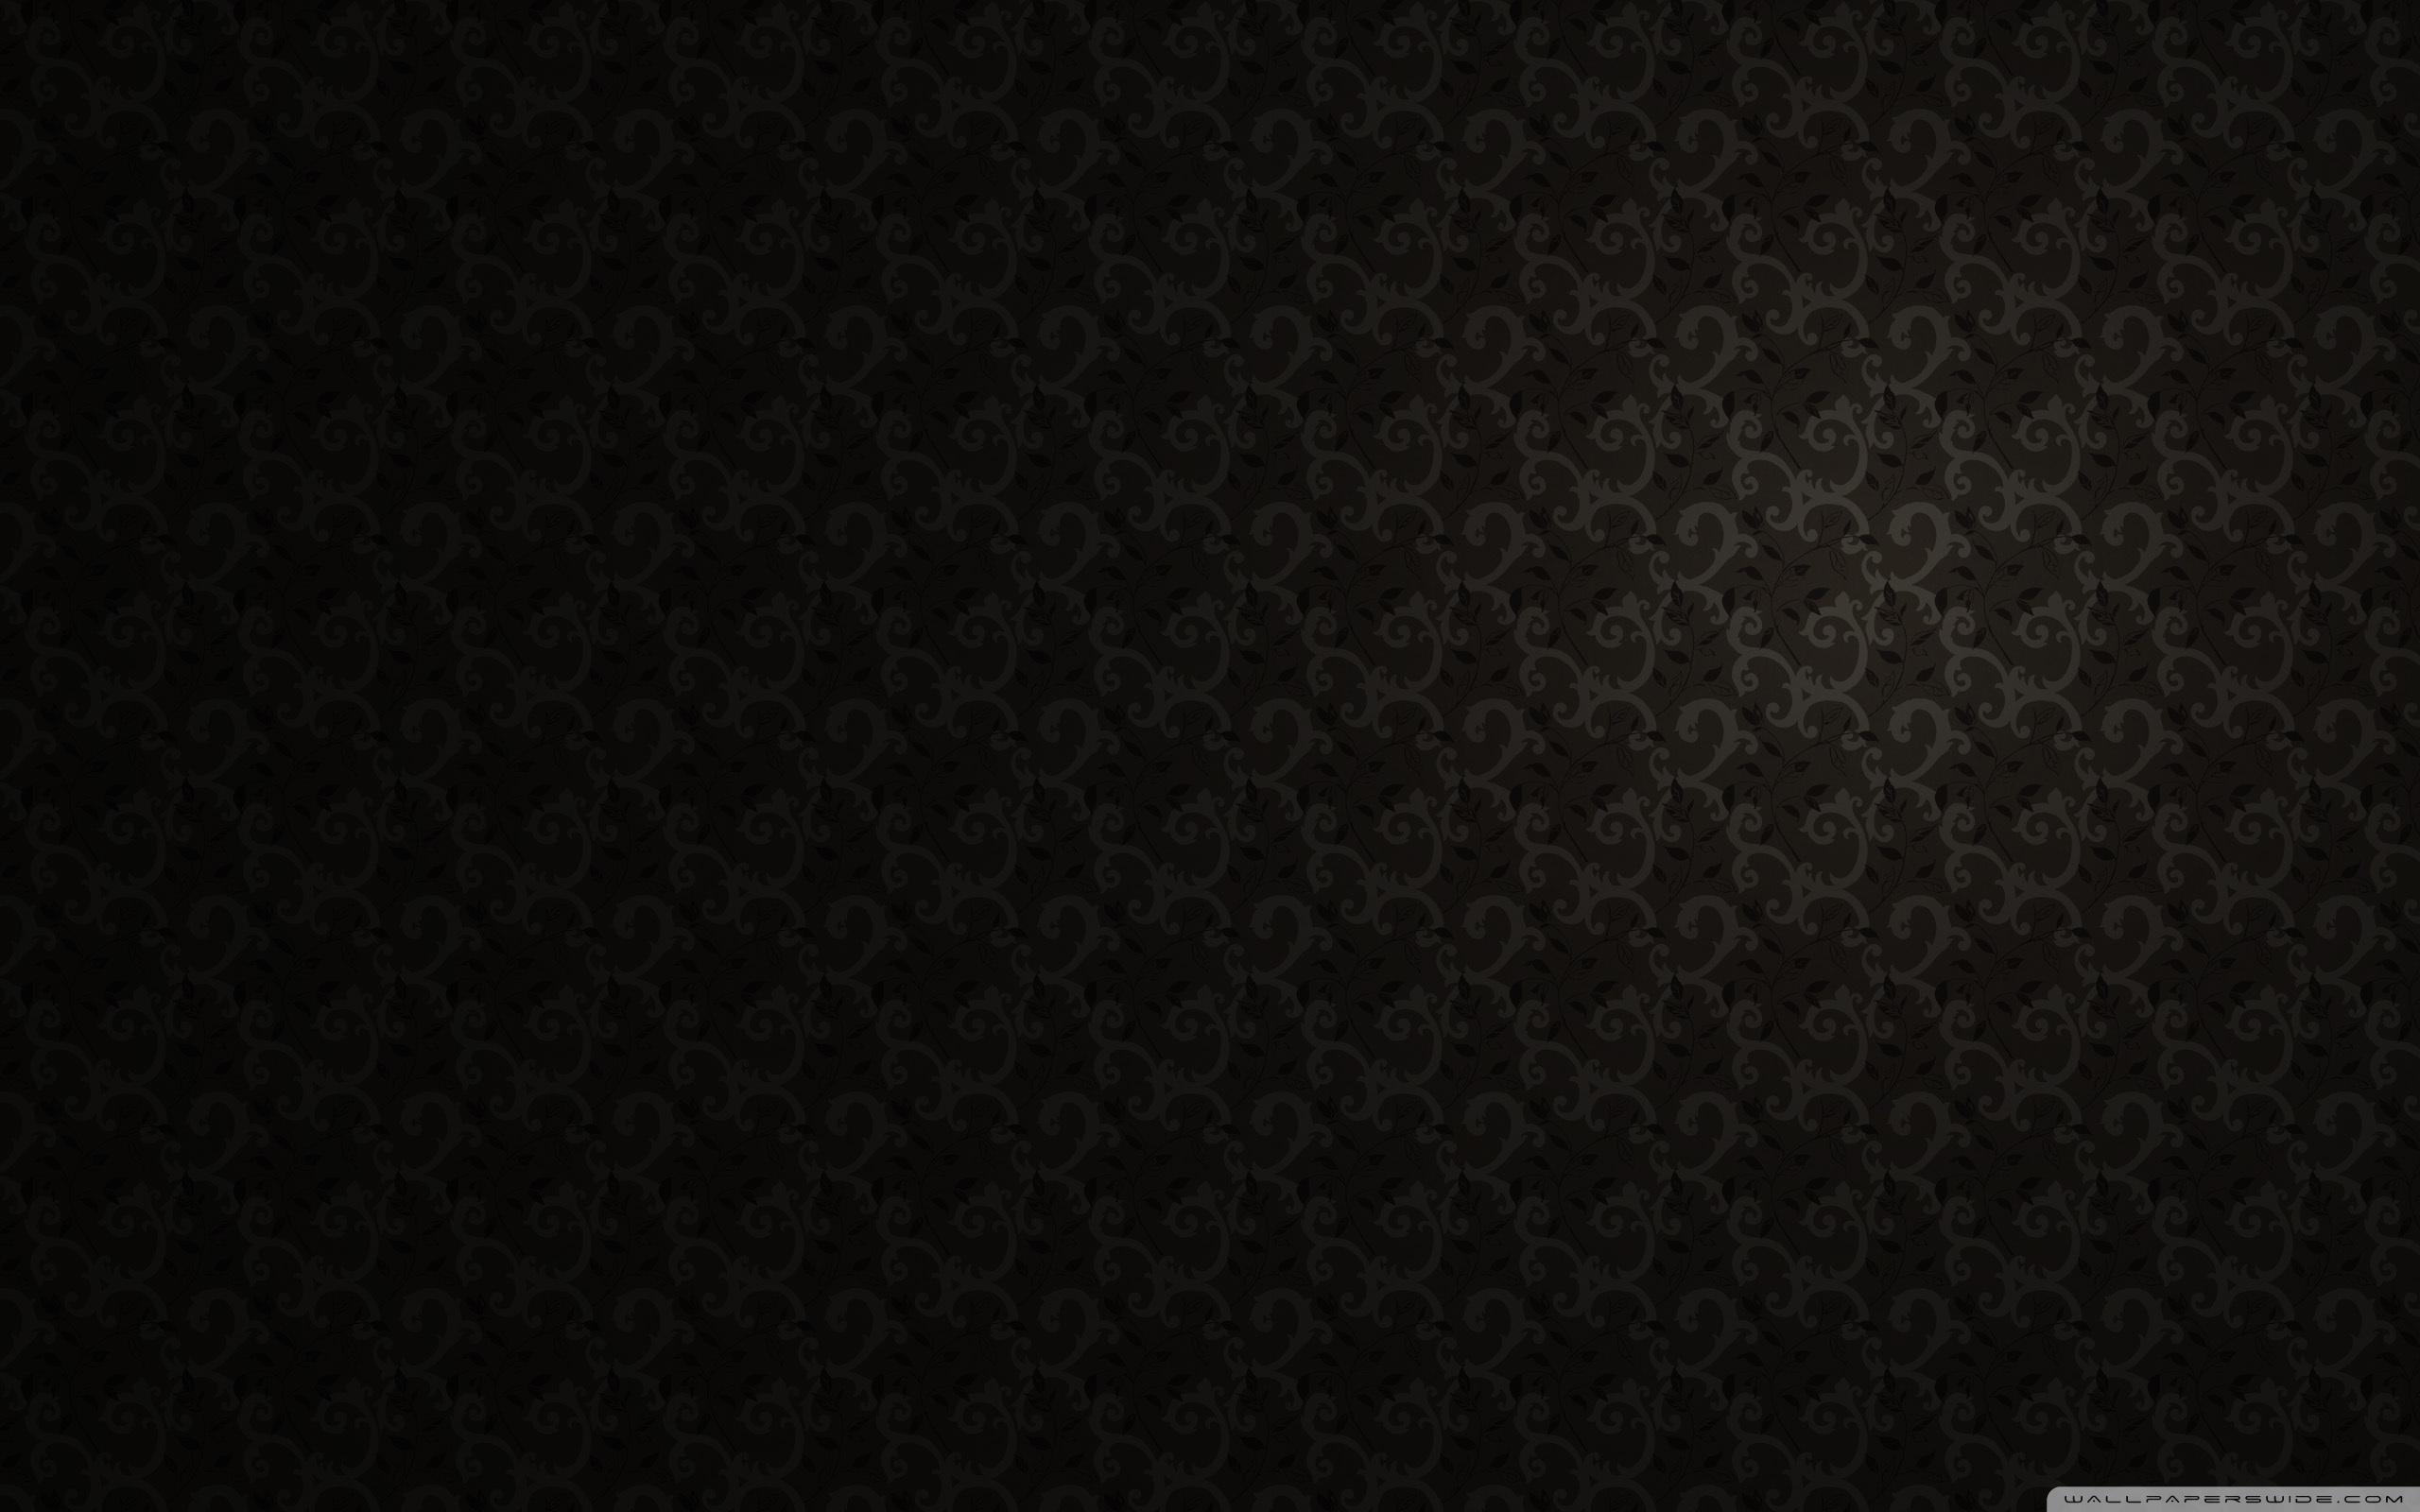 Mito ou verdade: wallpaper escuro ajuda a economizar bateria do